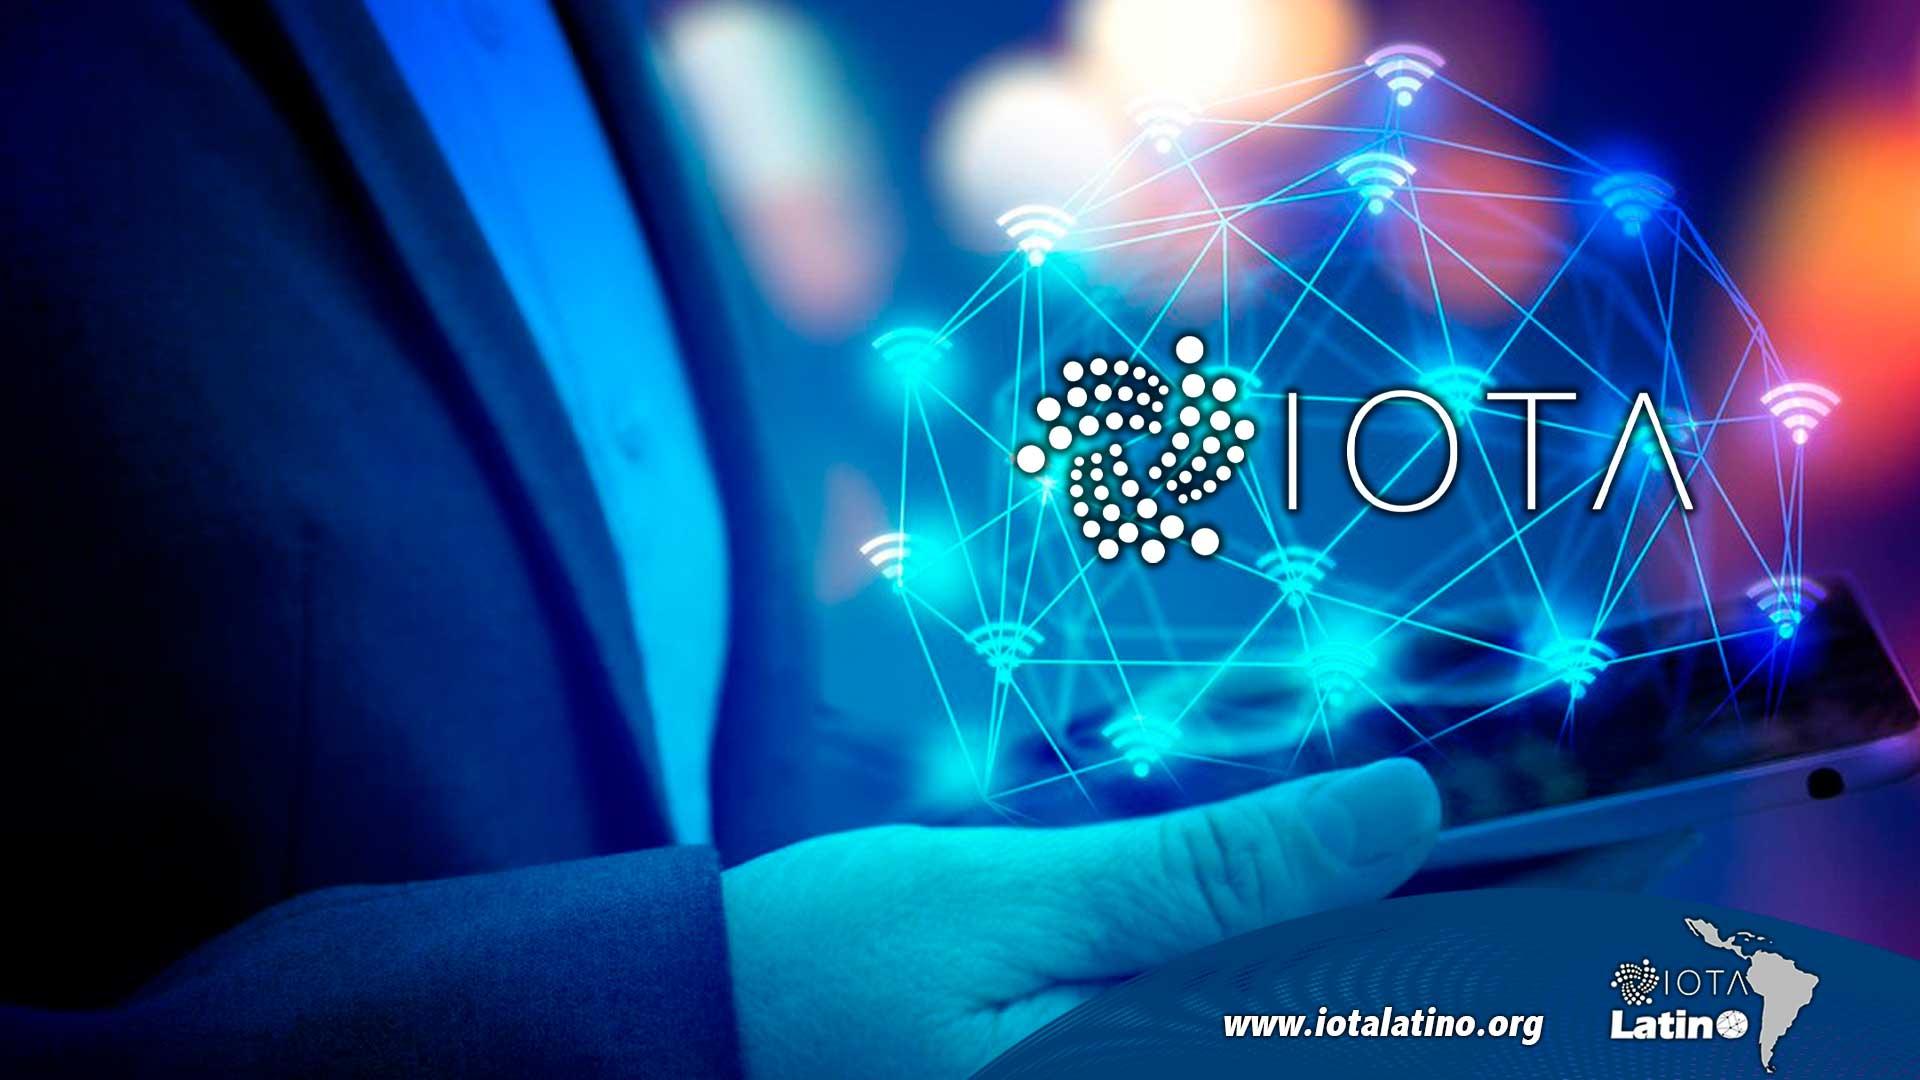 Avances de IOTA - IOTA LAtino